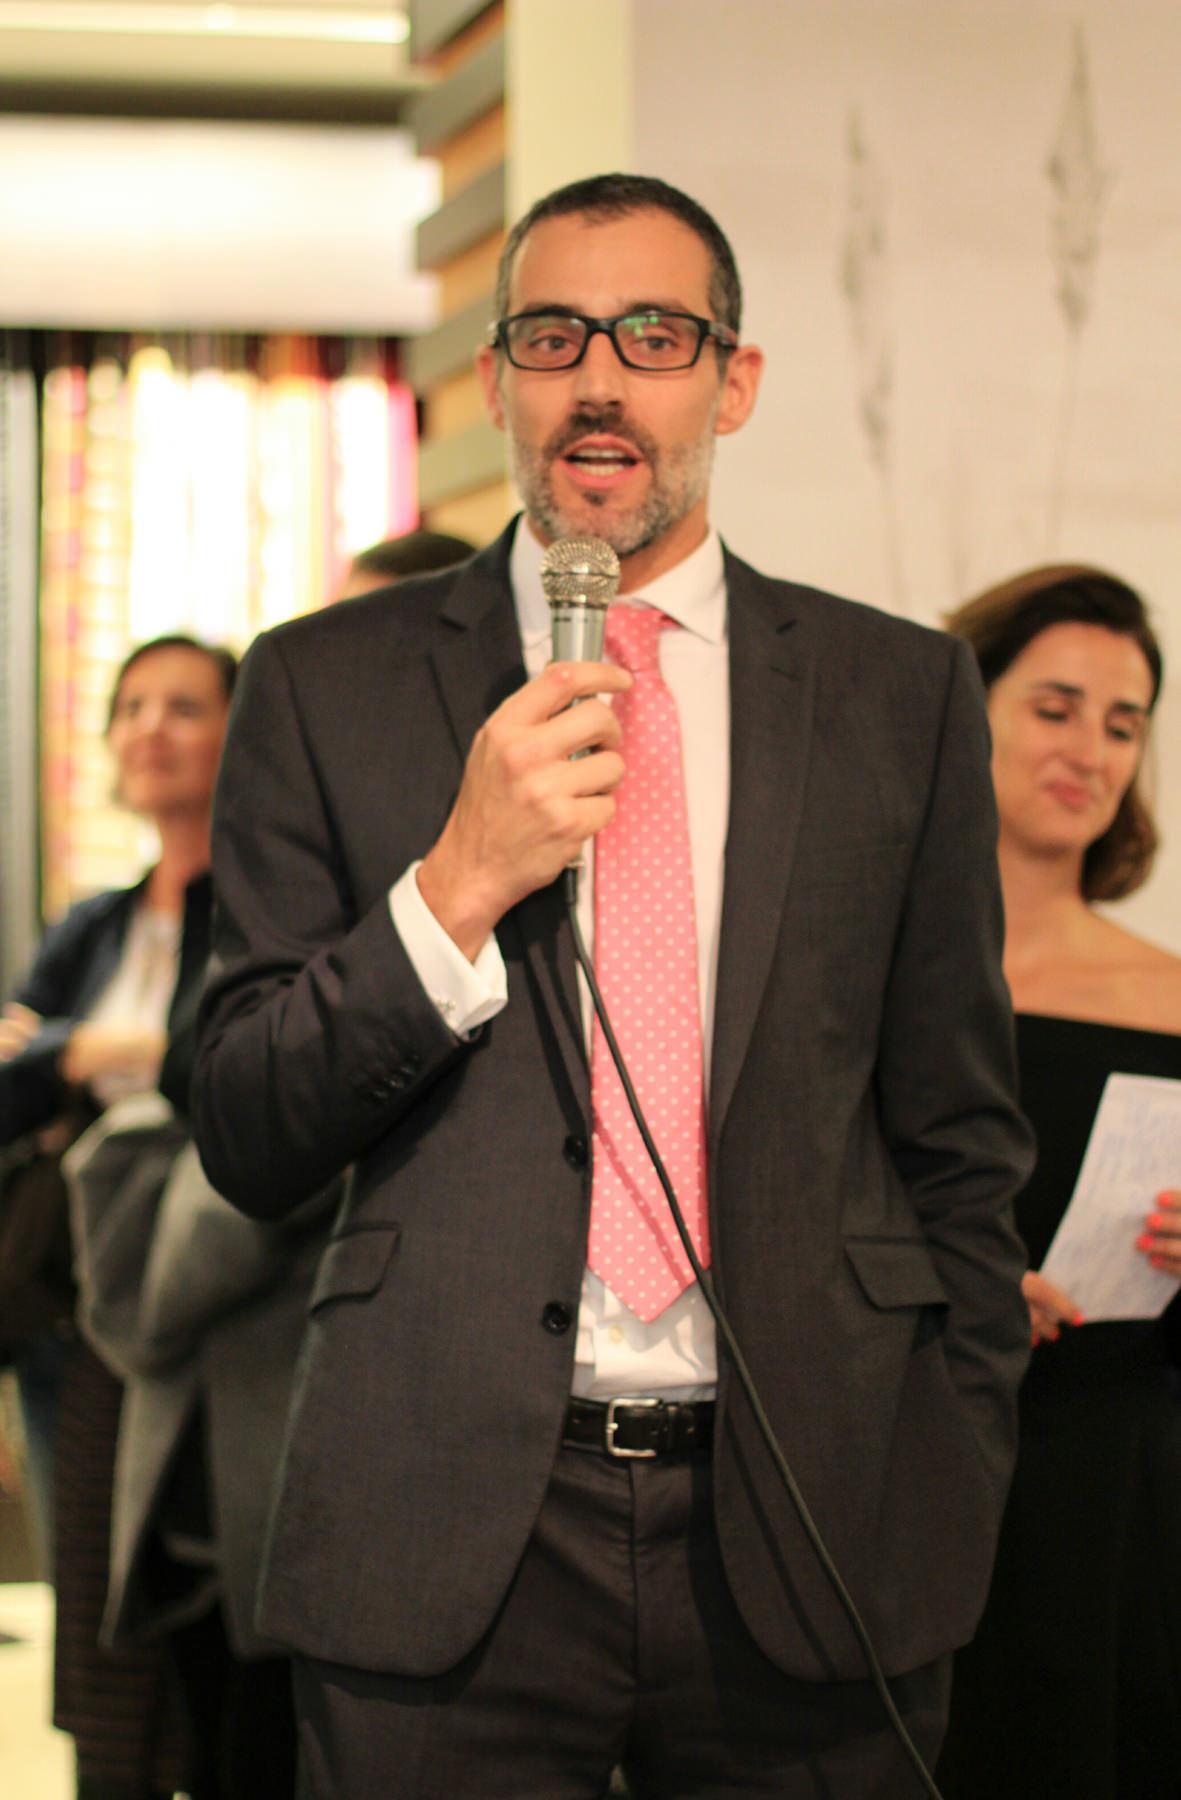 Fiesta Adivina 2015/2016, expertos